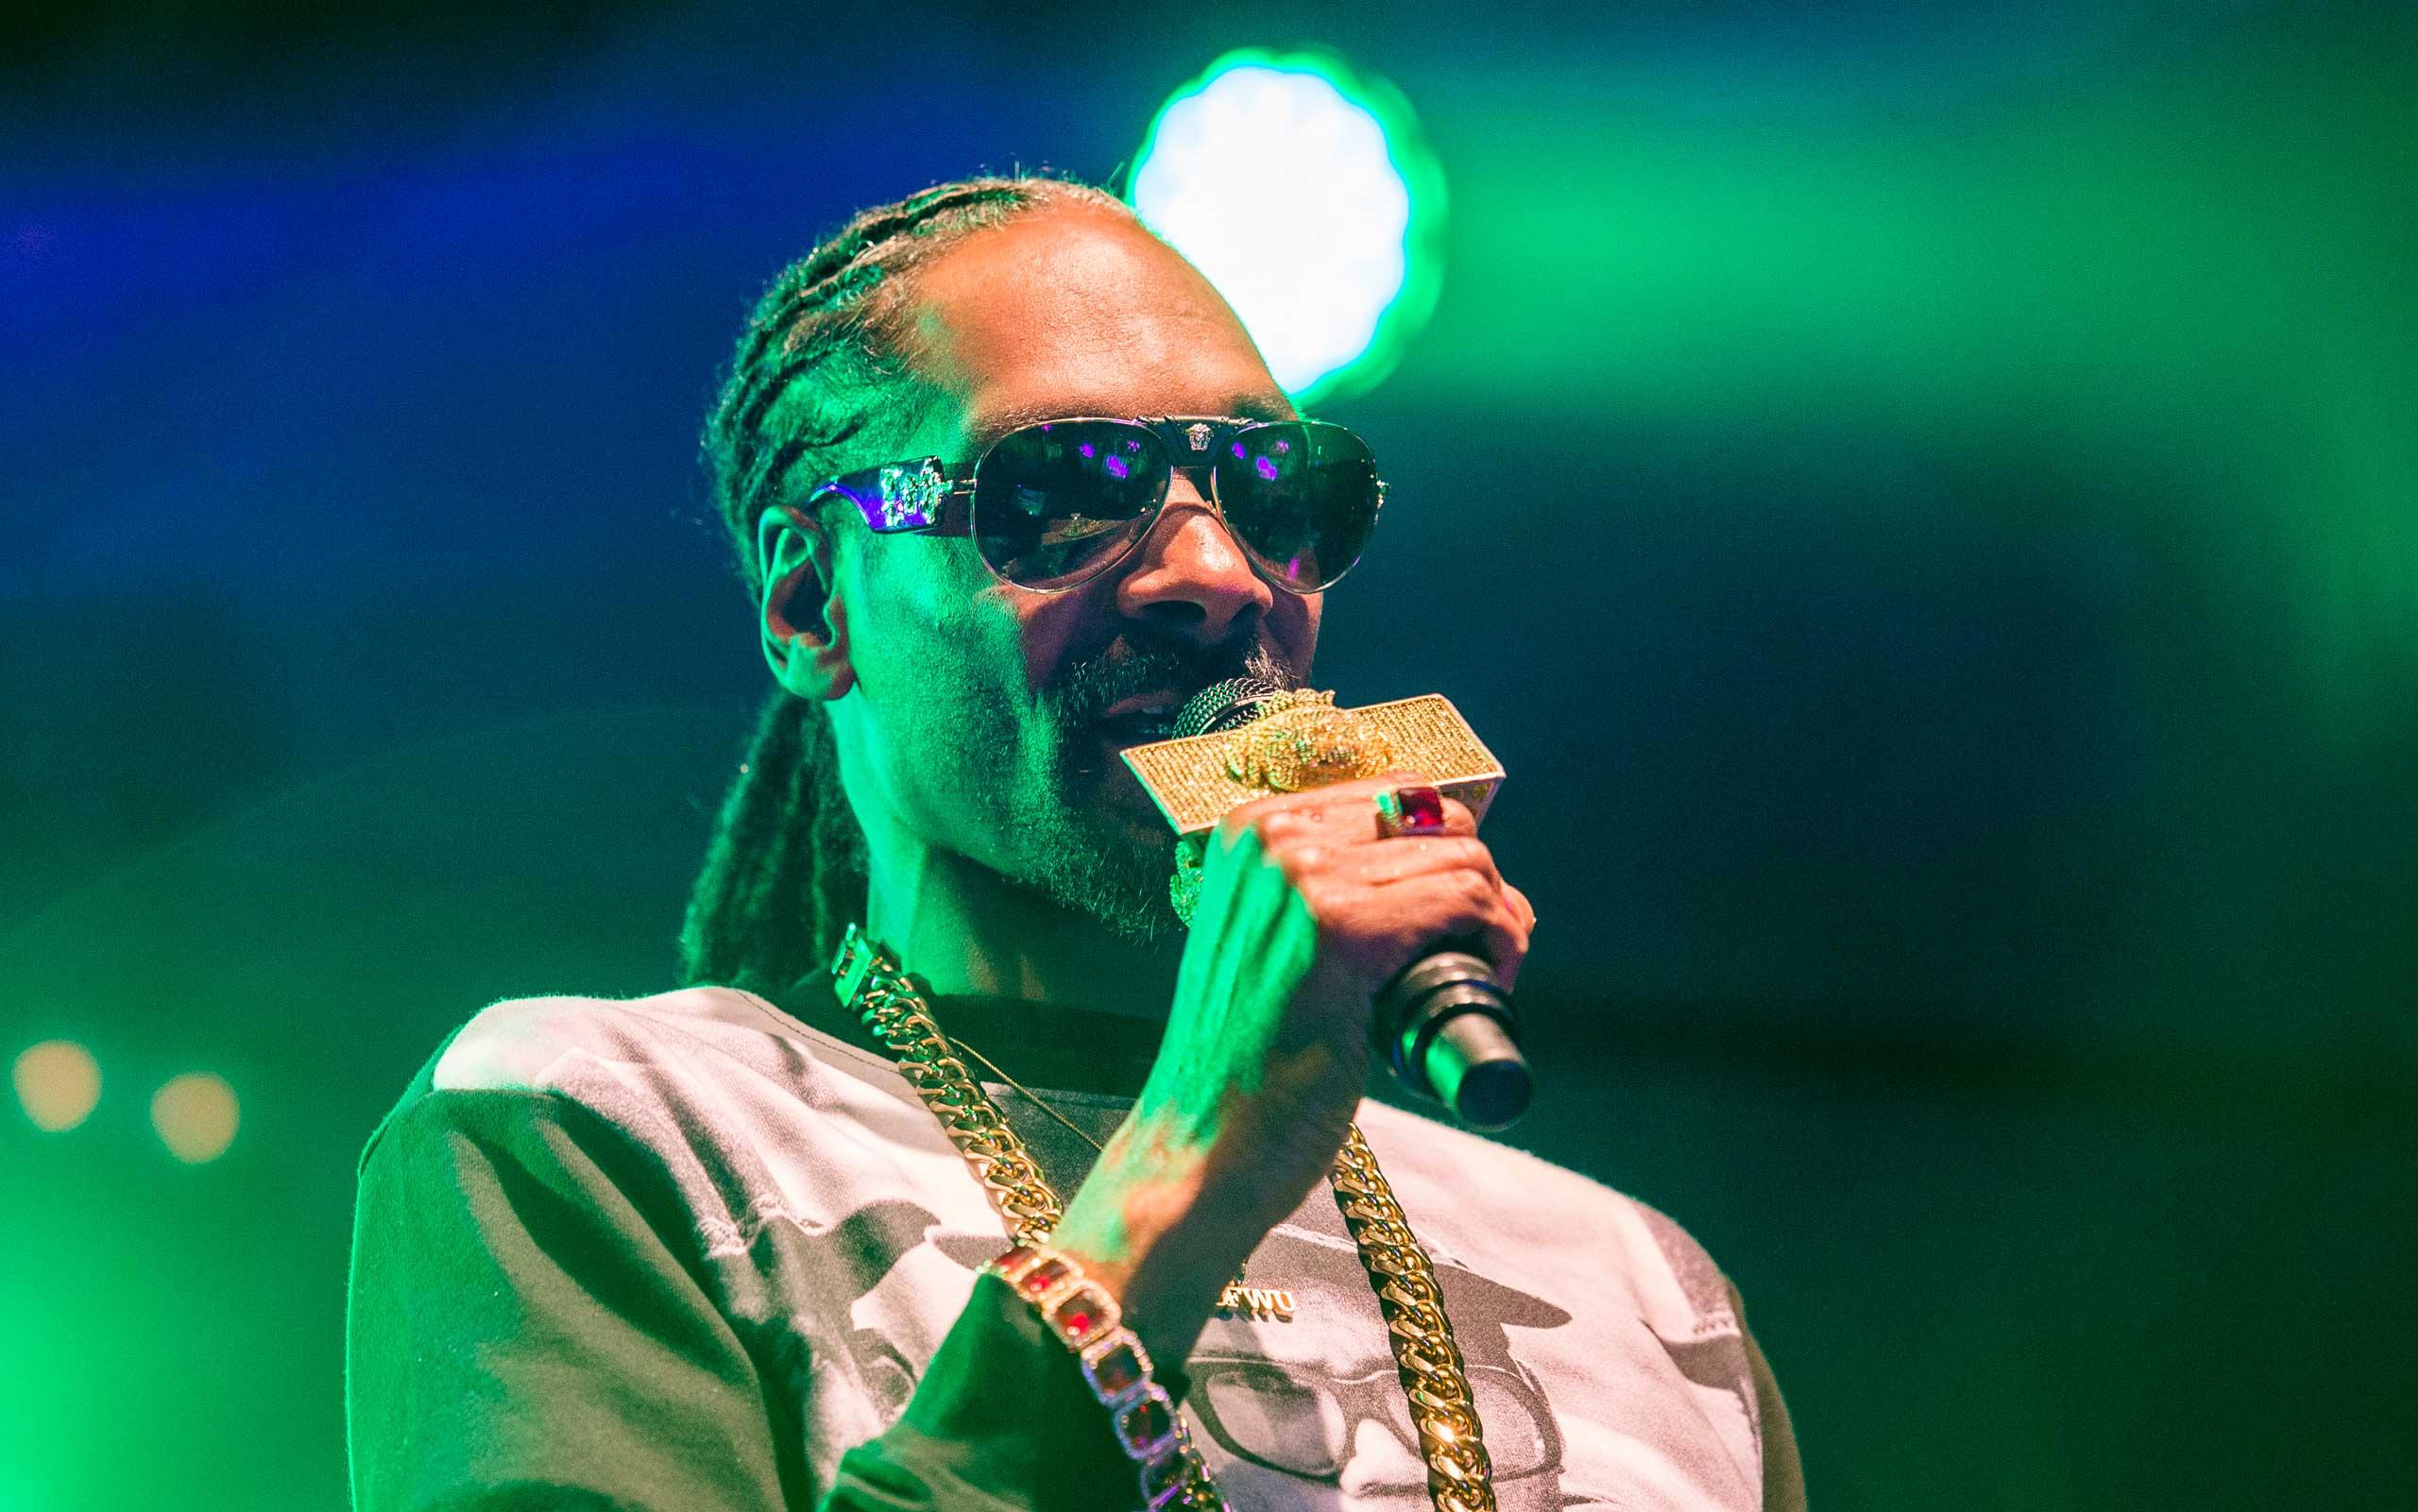 US rapper Snoop Dogg performing in Uppsala, Sweden, on July 25, 2015.